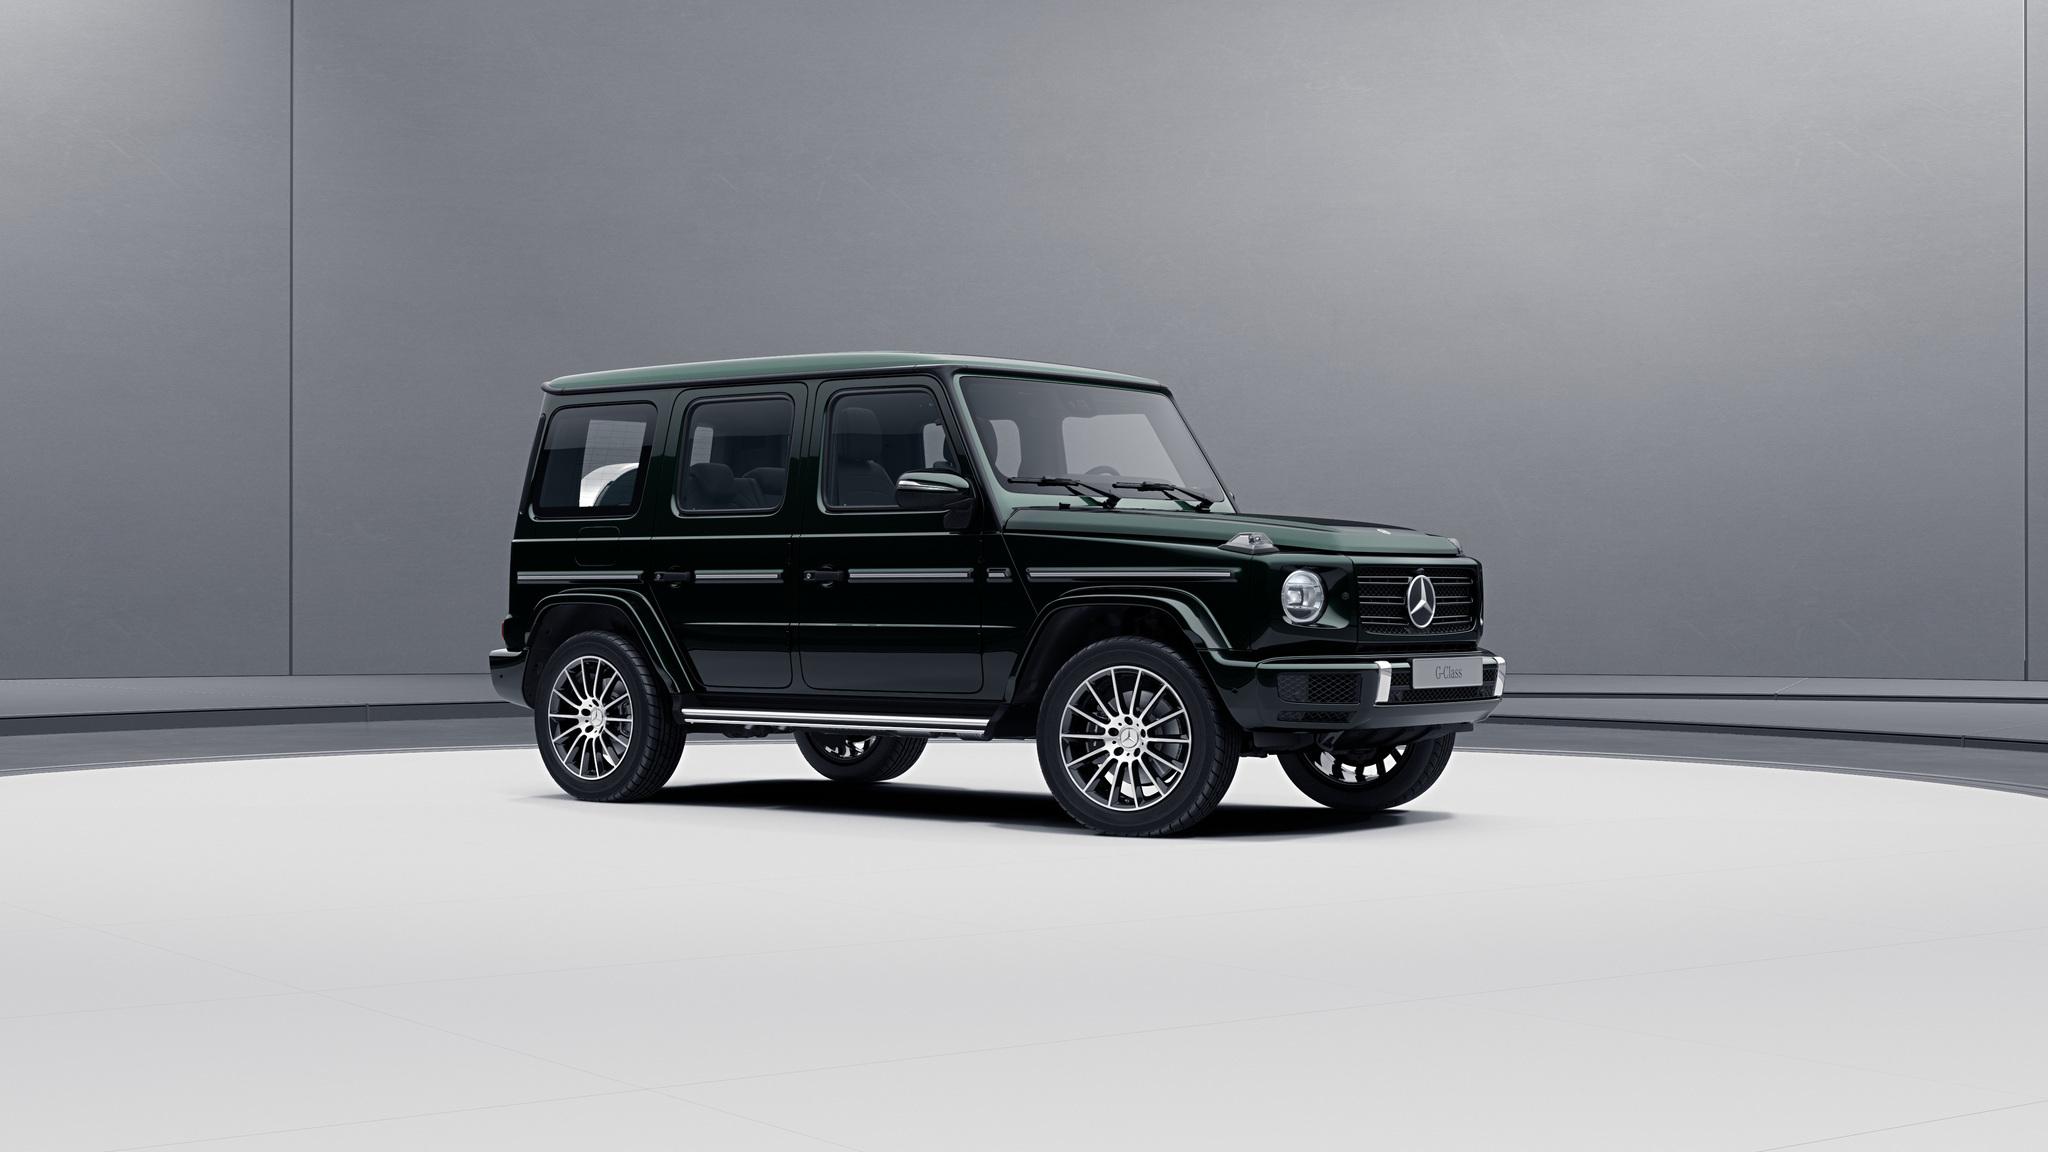 Vue de trois quarts de profil de la Mercedes-Benz Classe G avec la peinture Métallisé Vert Emeraude